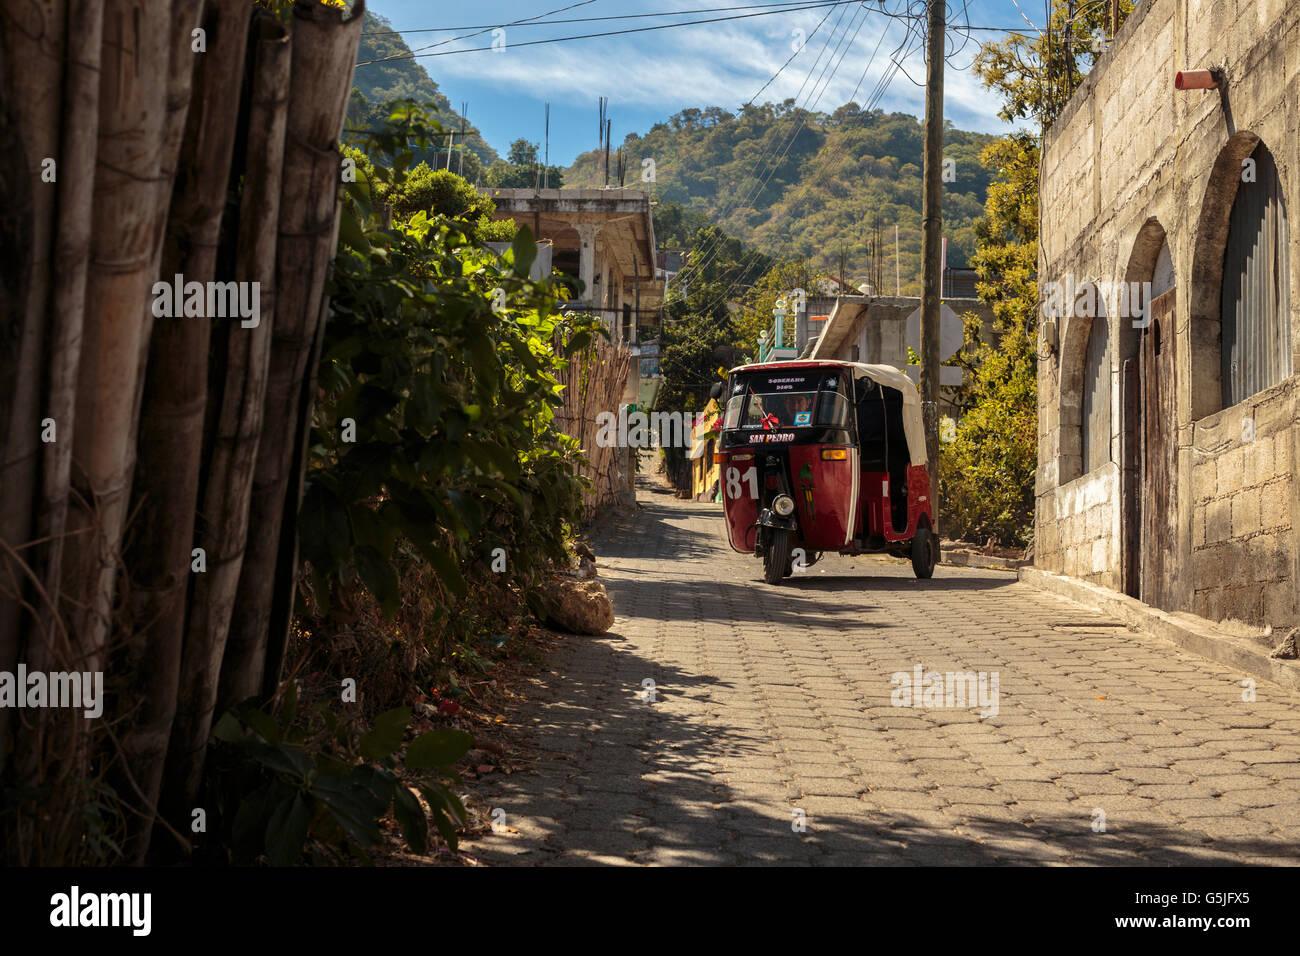 A motocar taxi navigates the streets of San Pedro La Laguna in Lake Atitlan Guatemala, a popular tourist destination. - Stock Image